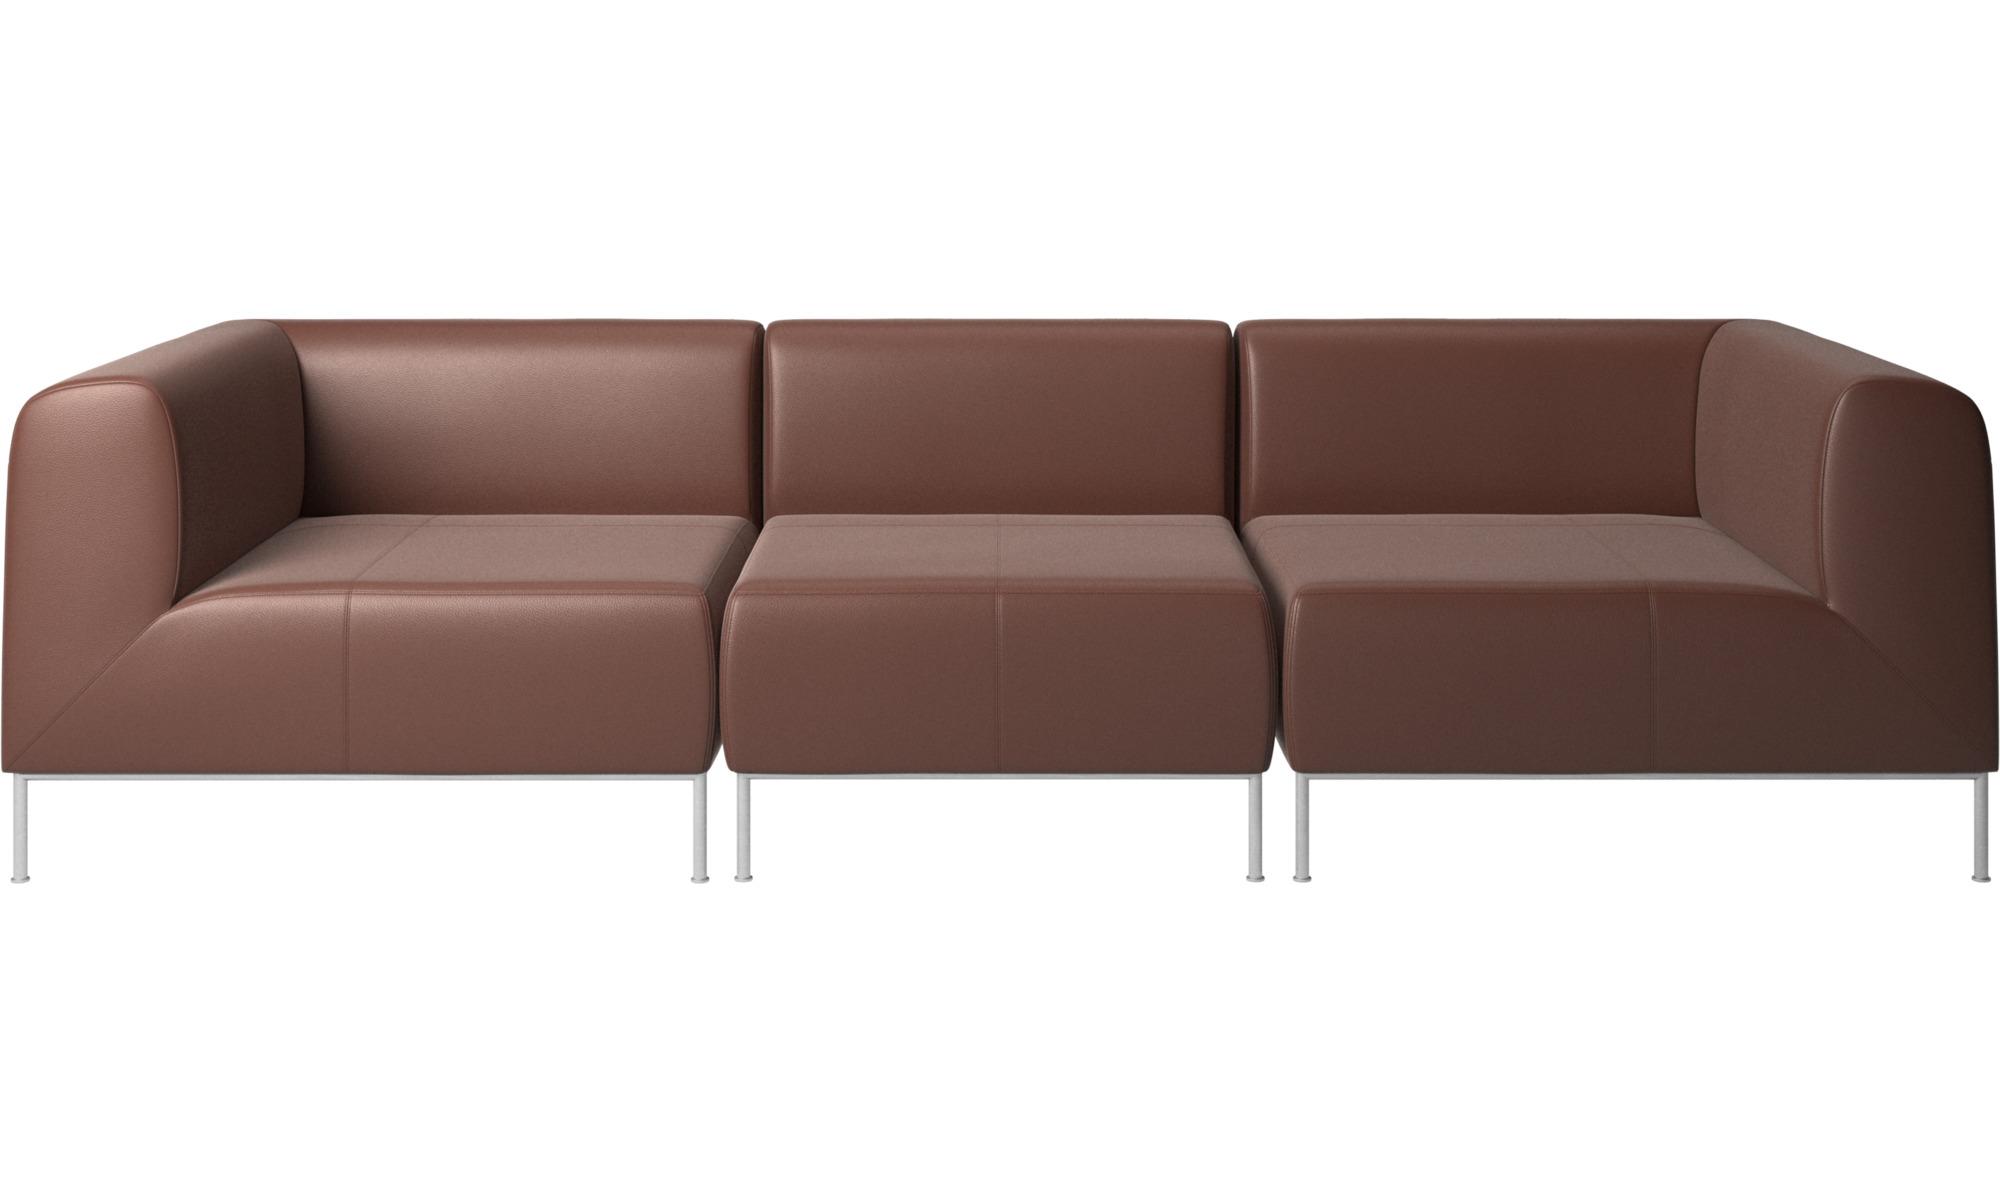 Full Size of Sofa Leder Braun Couch Gebraucht Ledersofa Design 3 2 1 Set 2 Sitzer   Chesterfield Vintage Ikea Rustikal 3 Sitzer Kaufen Otto Grün 3er Husse Grünes Canape Sofa Sofa Leder Braun